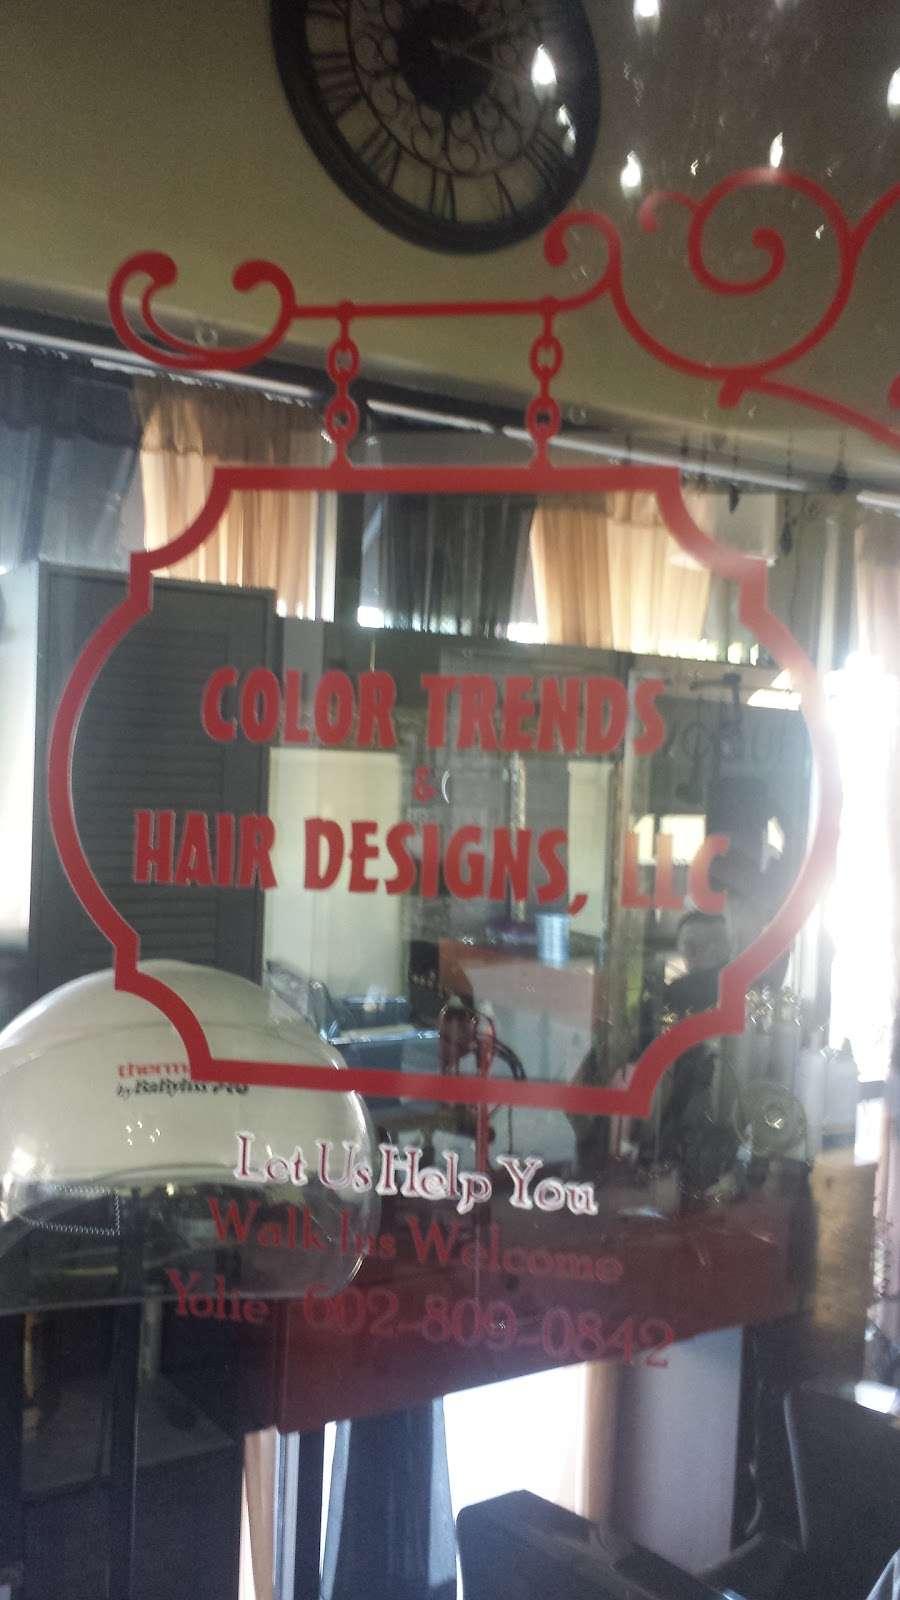 Color Hair & Trend Designs - hair care    Photo 6 of 10   Address: 16049 N Arrowhead Fountains Center Dr #30, Peoria, AZ 85382, USA   Phone: (602) 809-0842